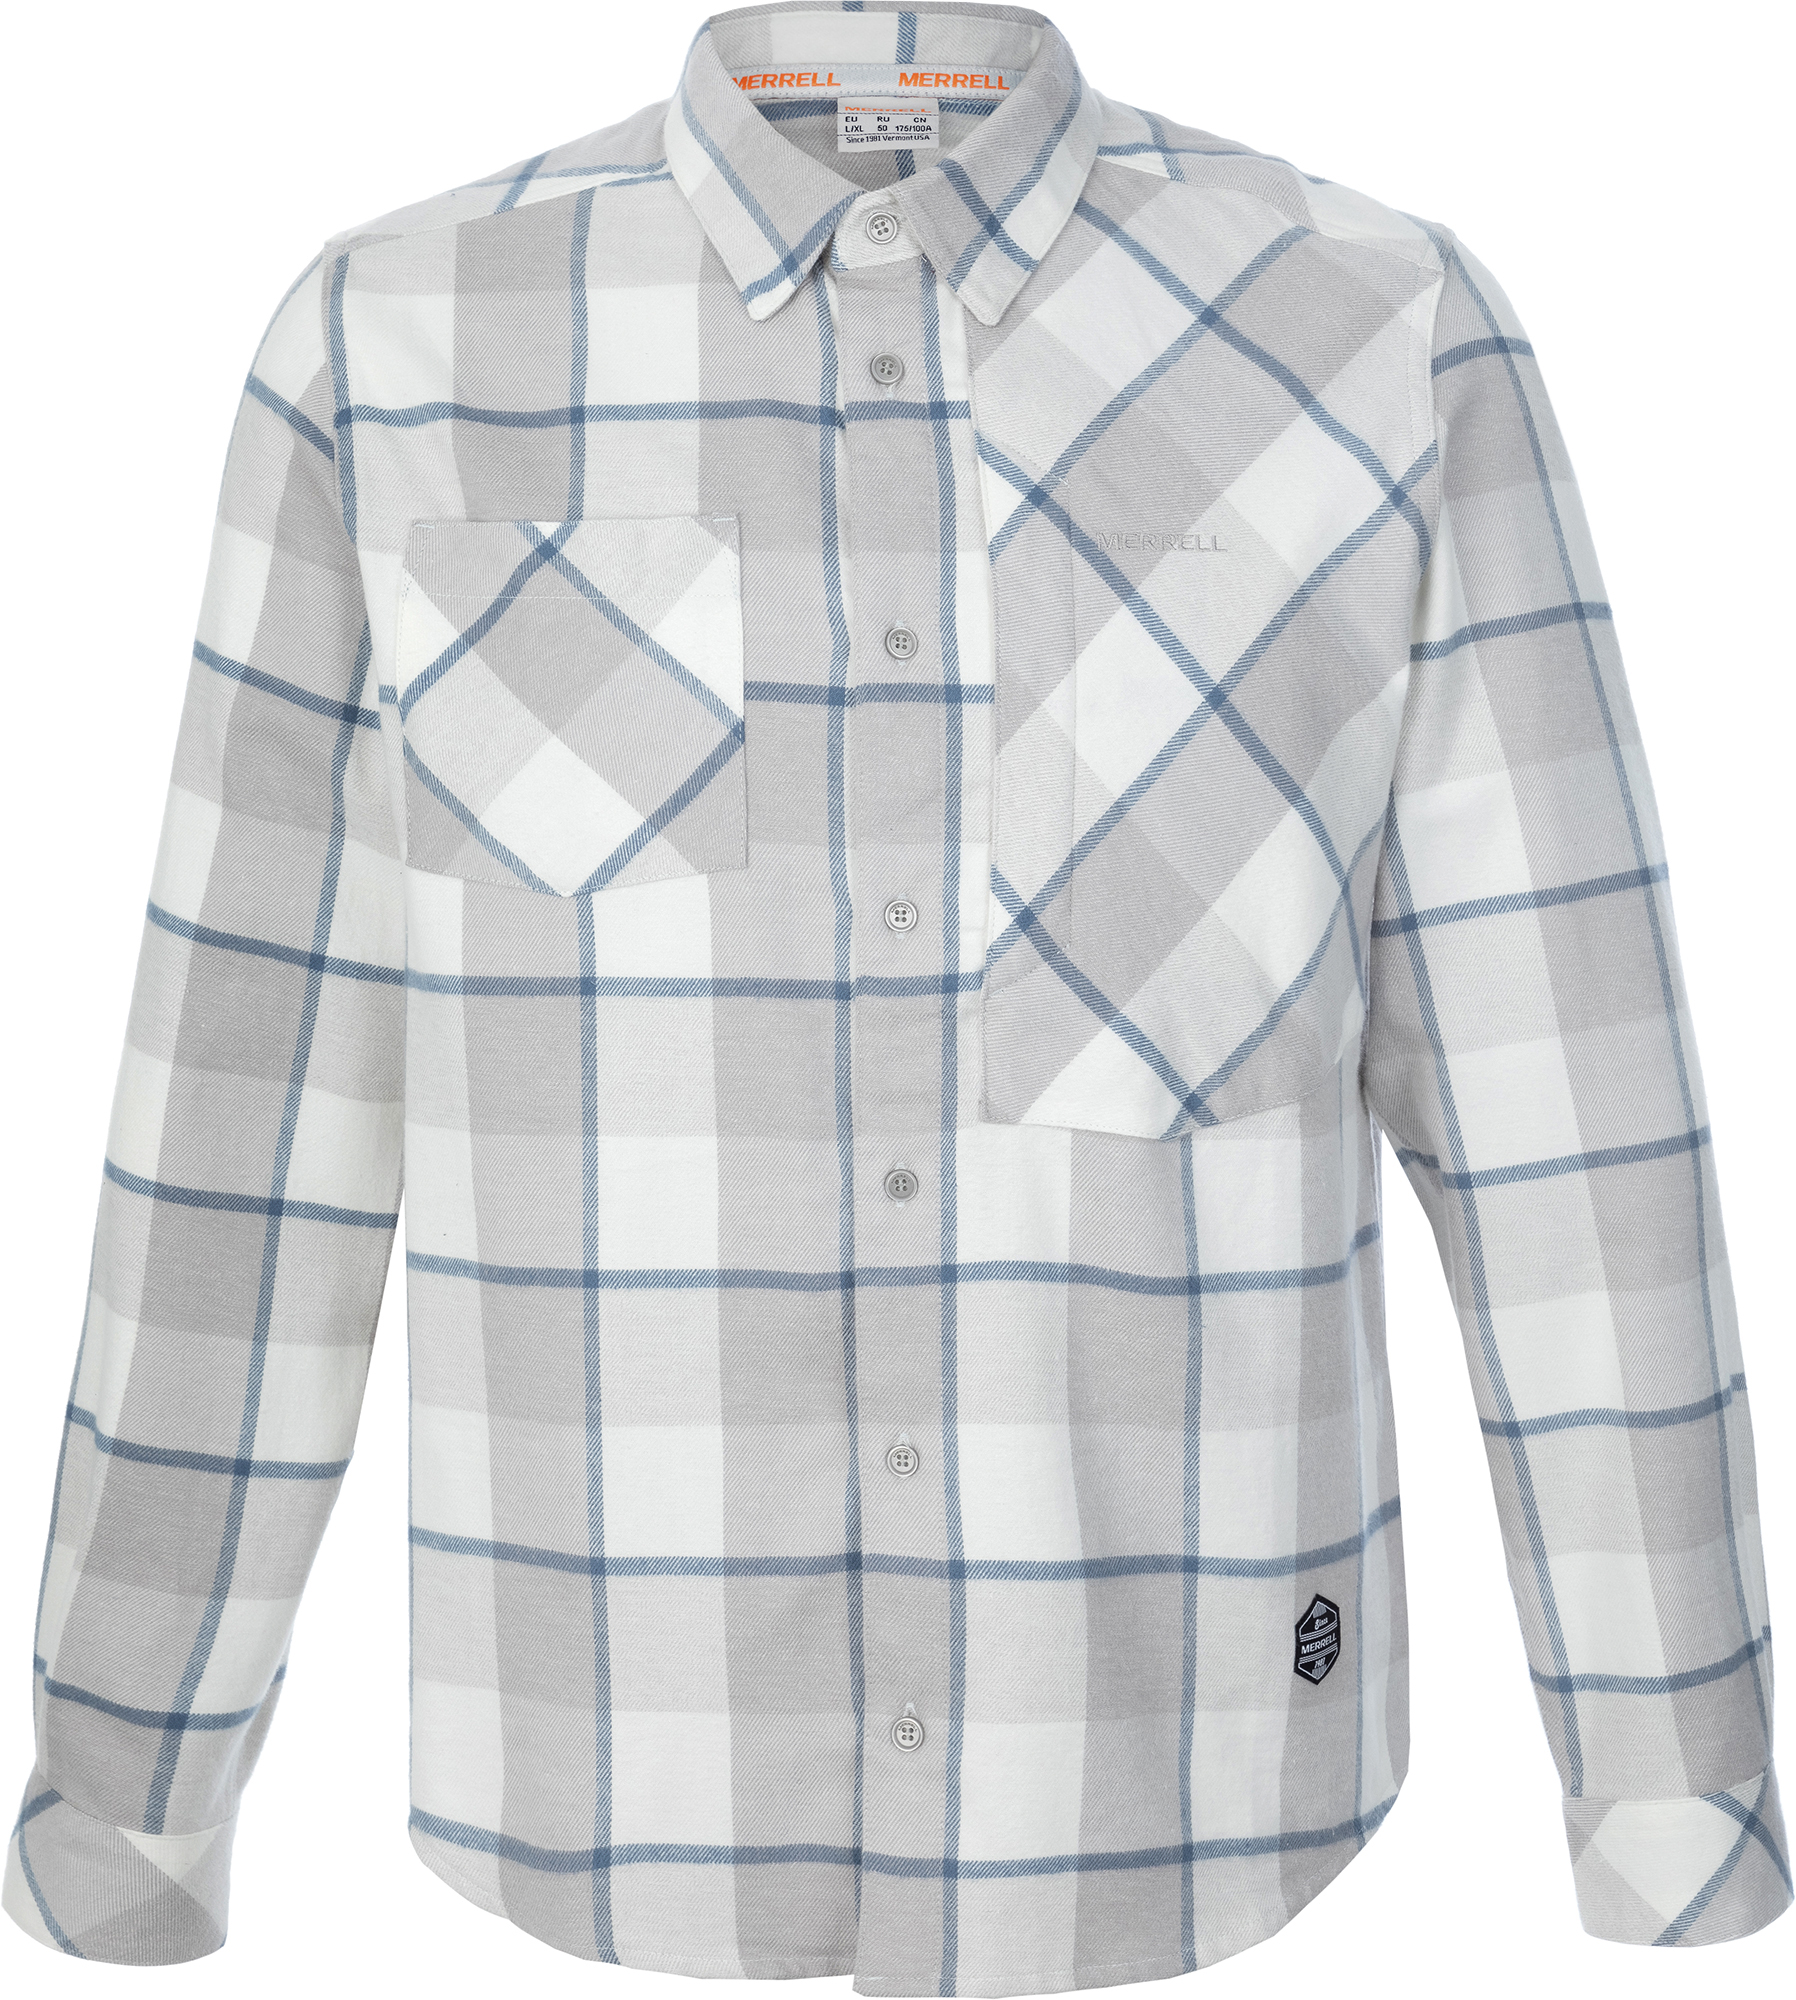 Merrell Рубашка мужская Merrell, размер 56 рубашка мужская jpe 2013 zara